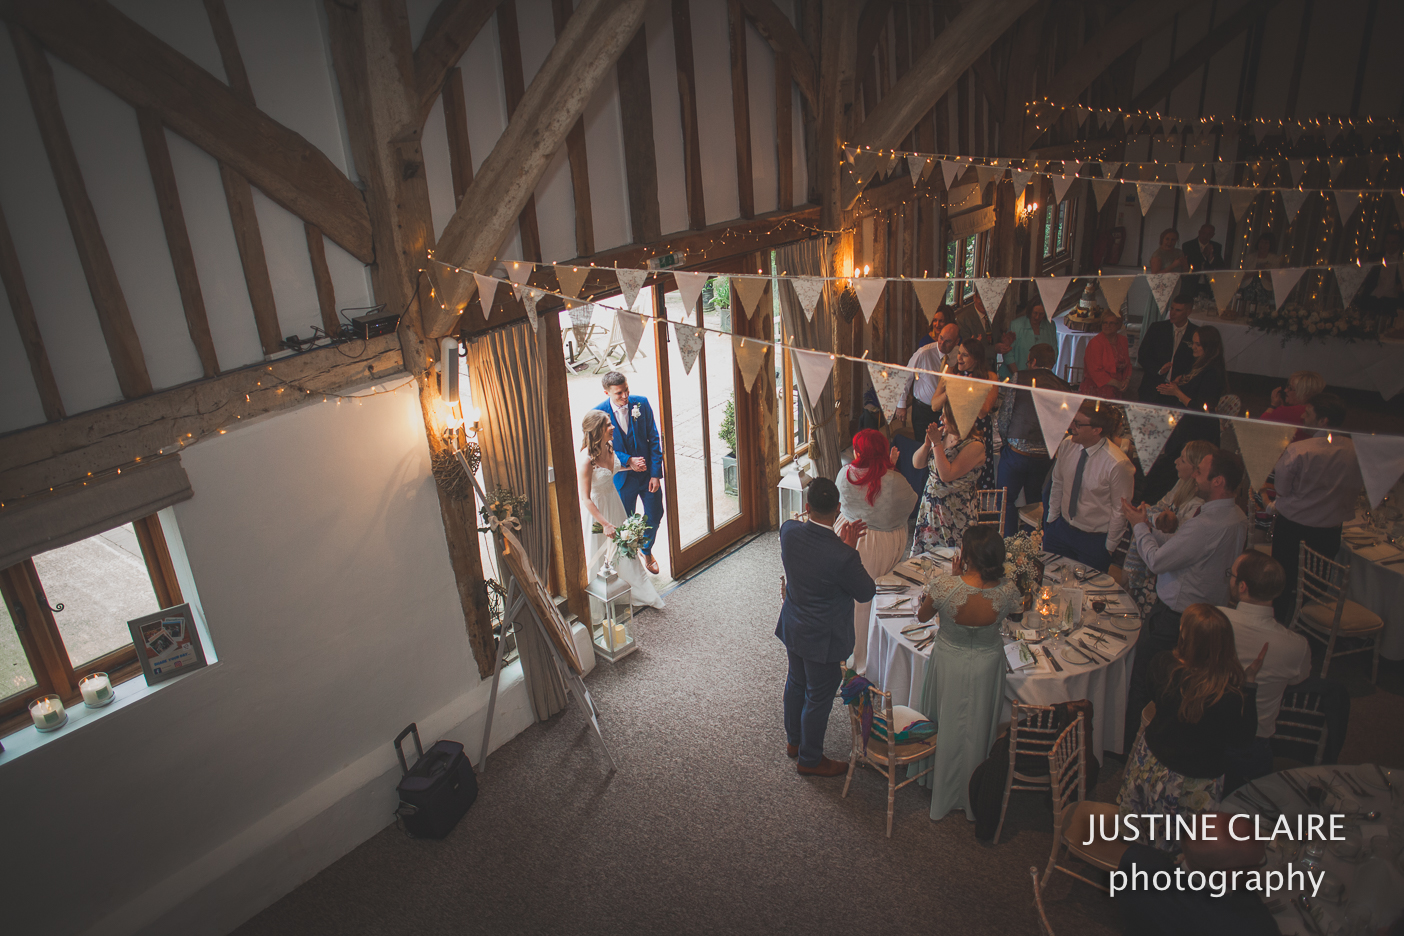 Fitzleroi Fittleworth petworth Billingshurst farm Wedding Photography by Justine Claire photographer Arundel Worthing Brighton-51.jpg